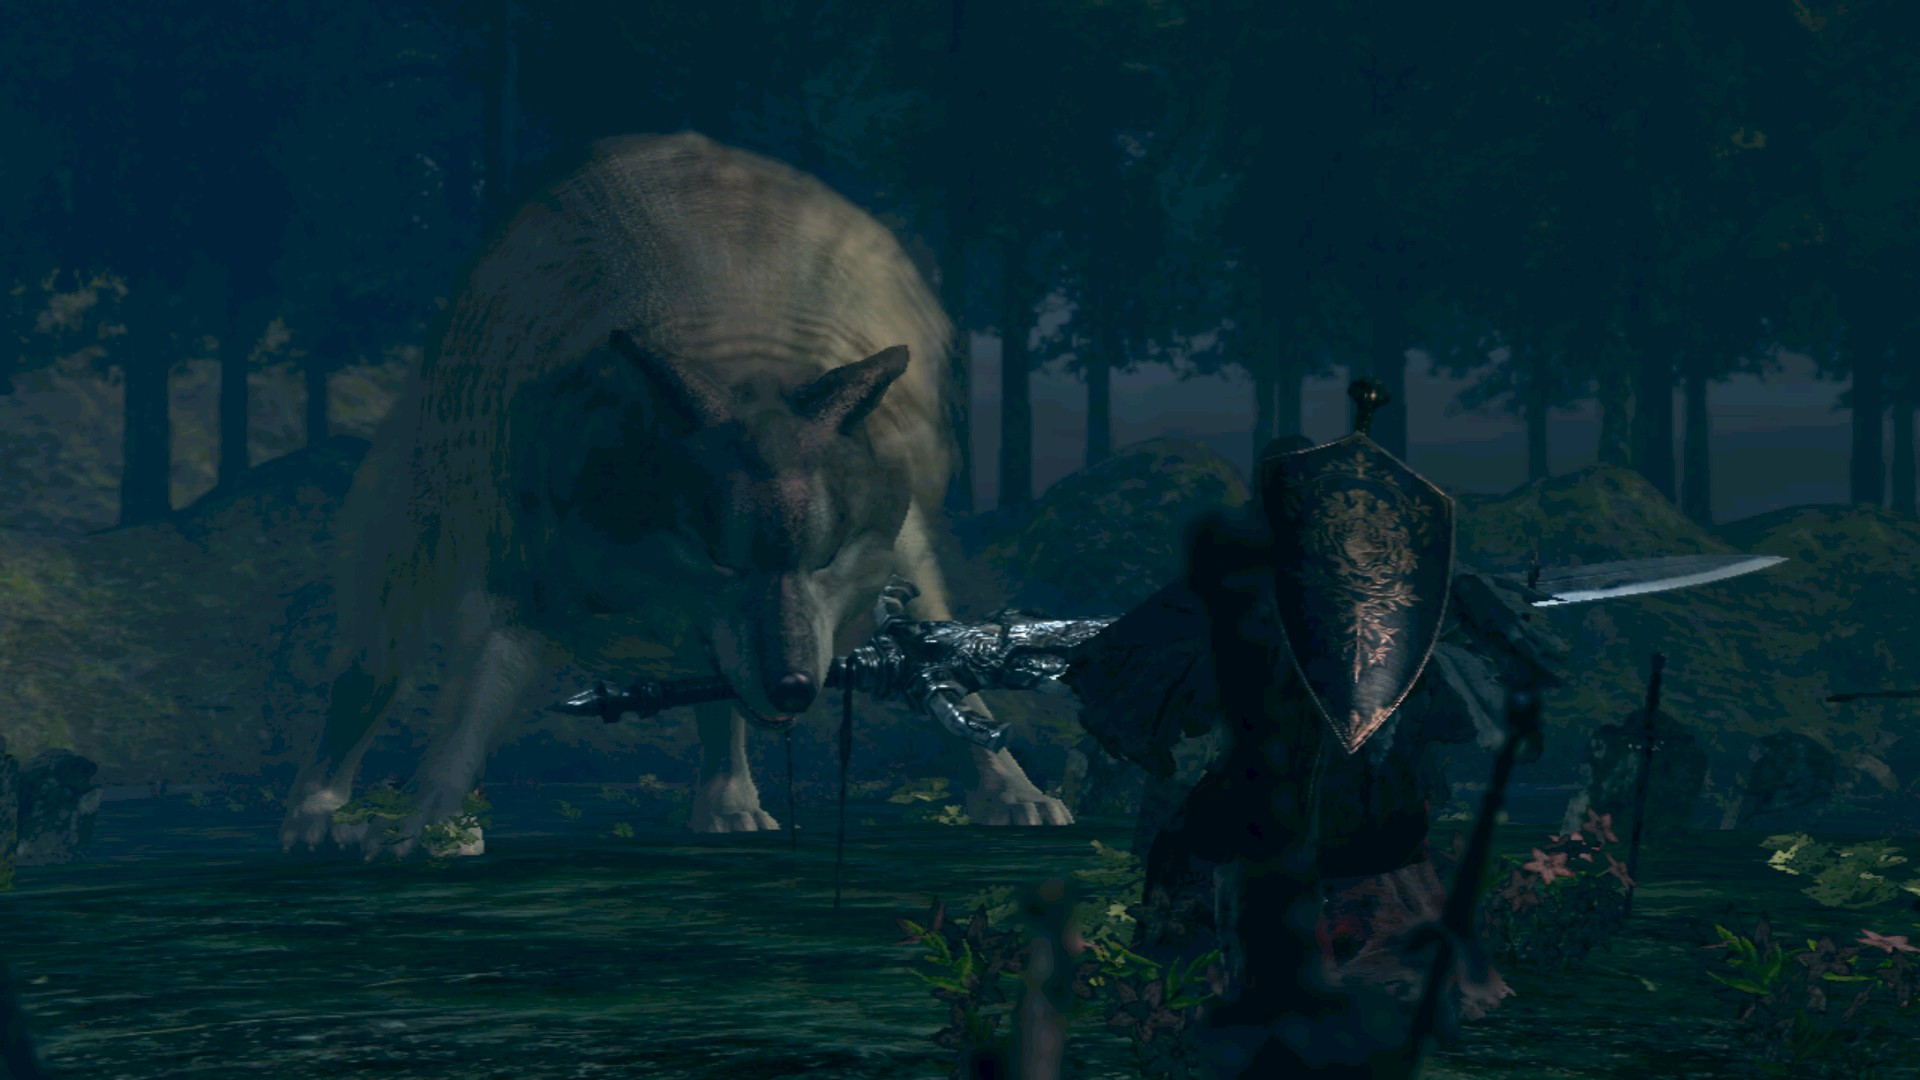 Sif the great grey wolf ۱۵ غول برتر سری Dark Souls